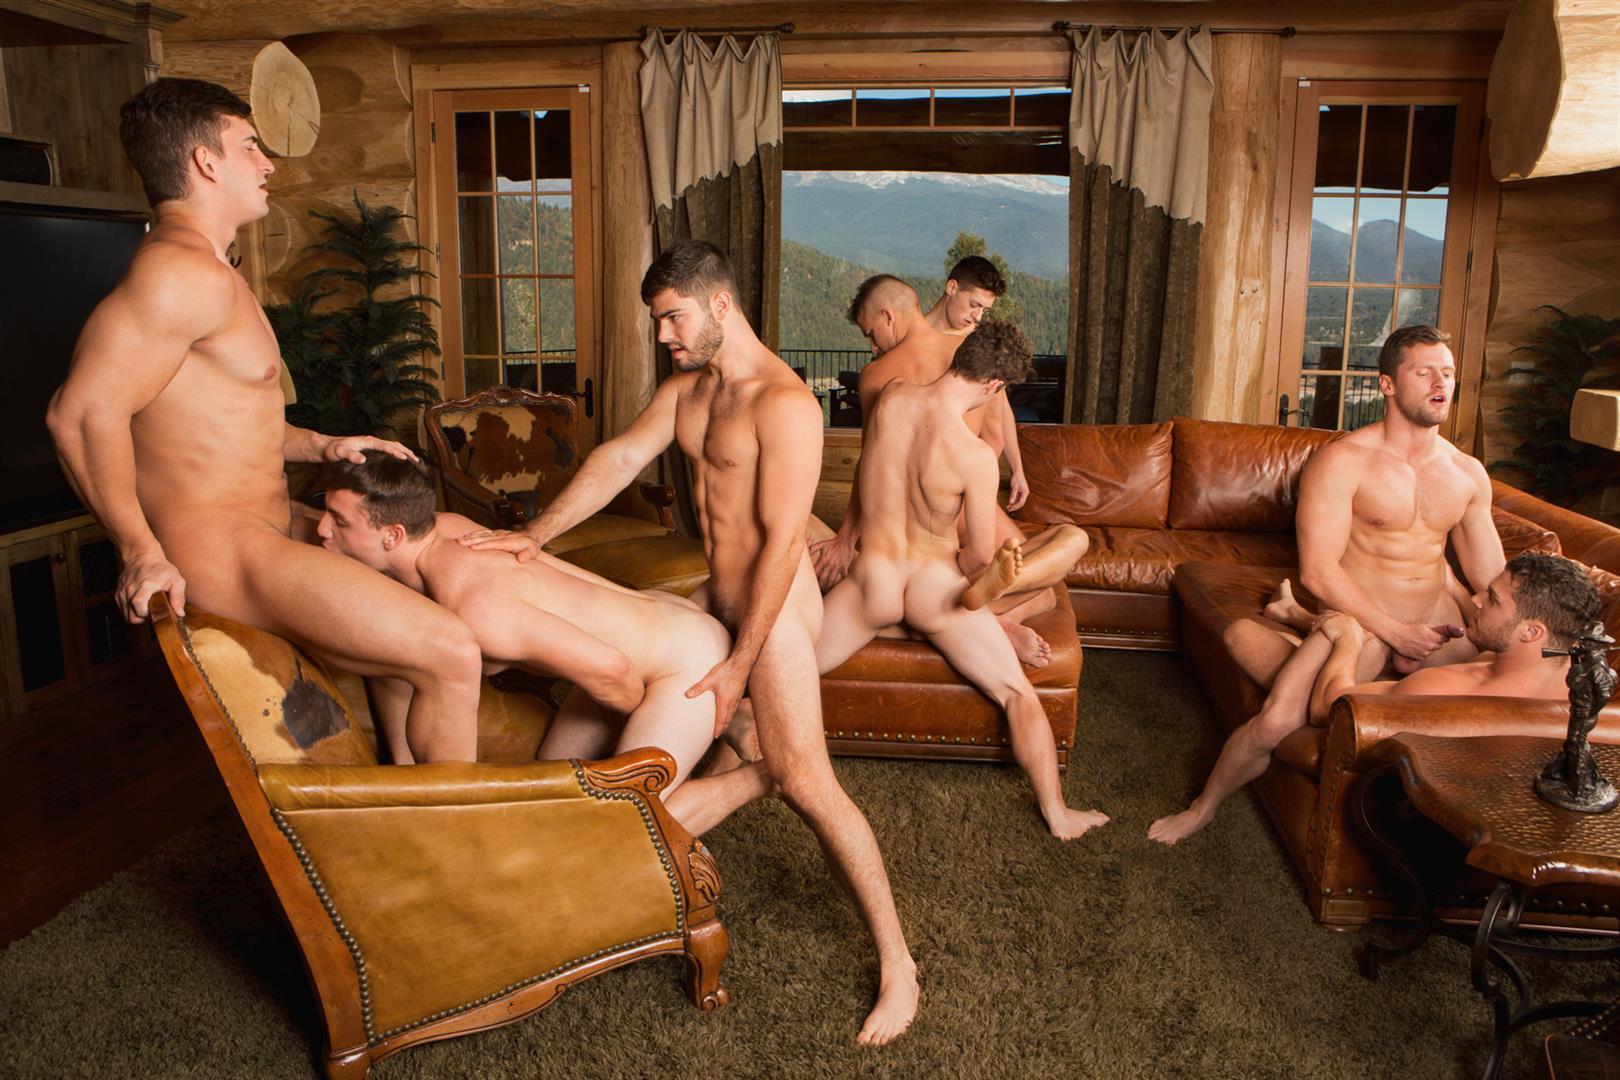 Sean-Cody-Winter-Getaway-Day-5-Big-Dick-Hunks-Fucking-Bareback-Amateur-Gay-Porn-14 Sean Cody Takes The Boys On A 8-Day Bareback Winter Getaway